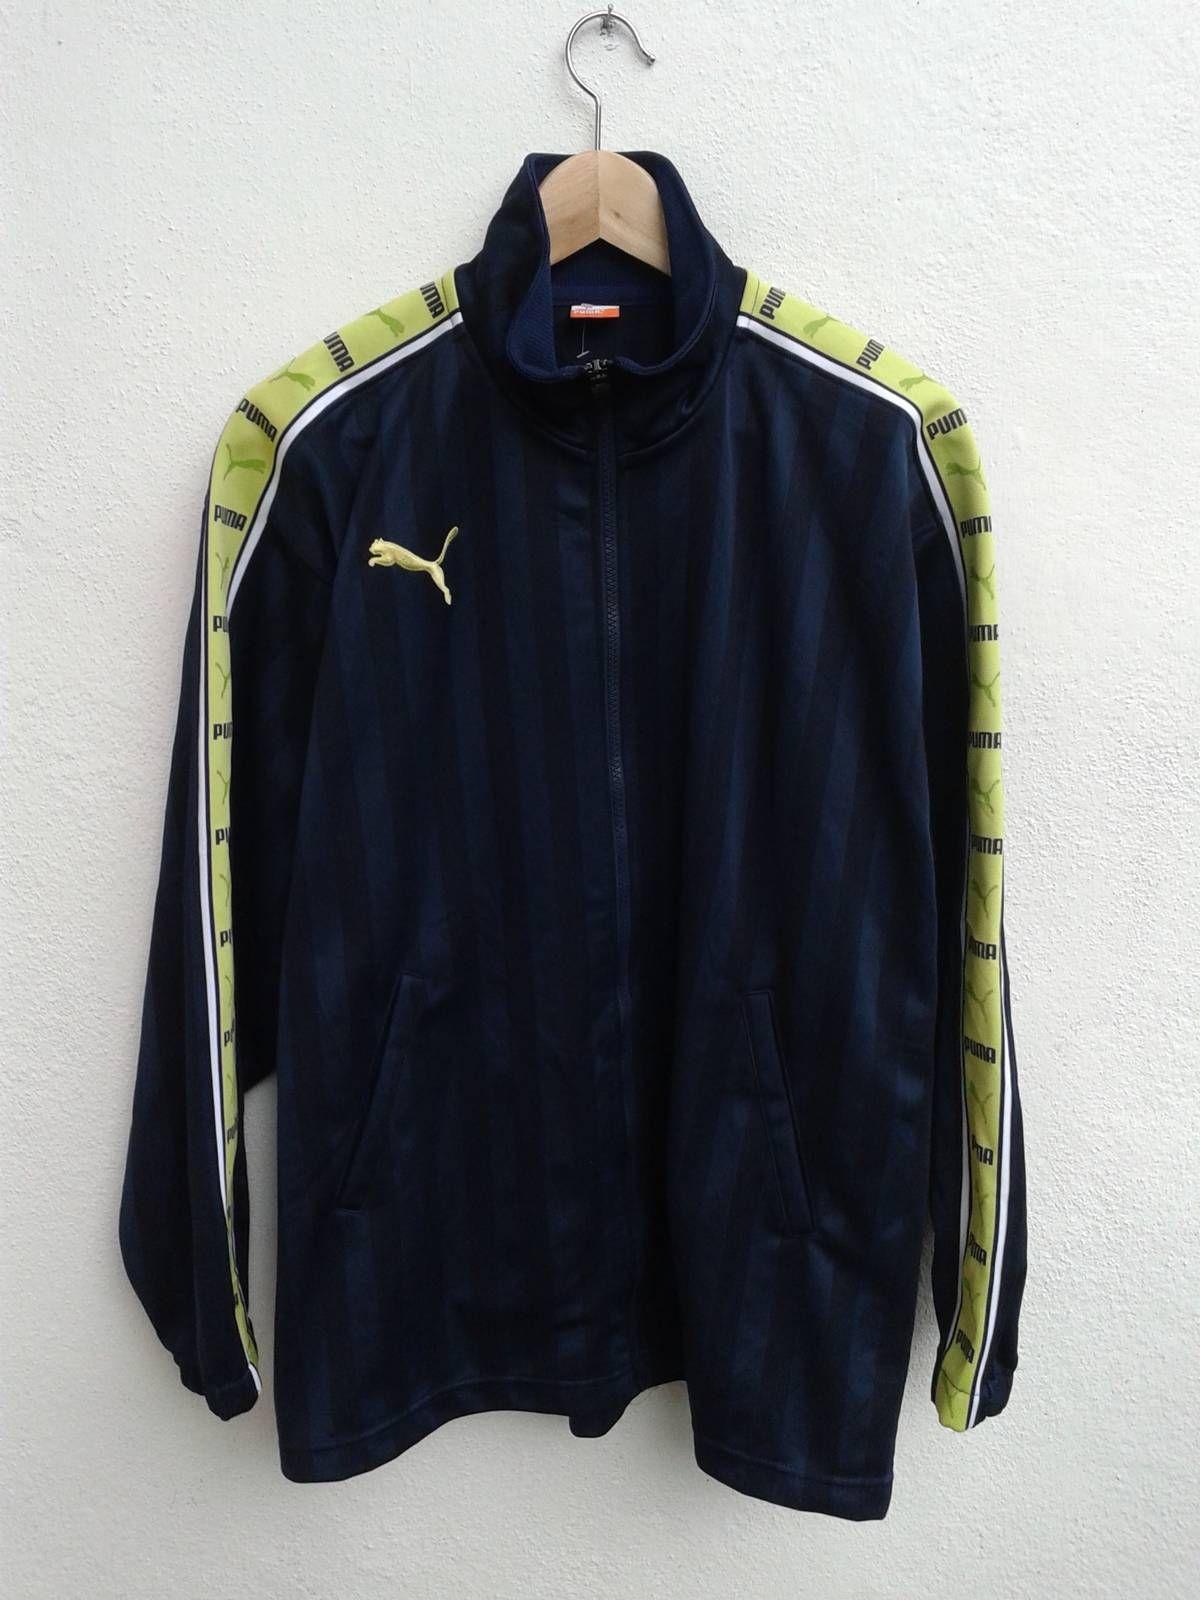 Puma Neon Sportswear Big Logo Sleeve Stripes Spell Out Running Jacket Size S M Running Jacket Jackets Vintage Jacket [ 1600 x 1200 Pixel ]